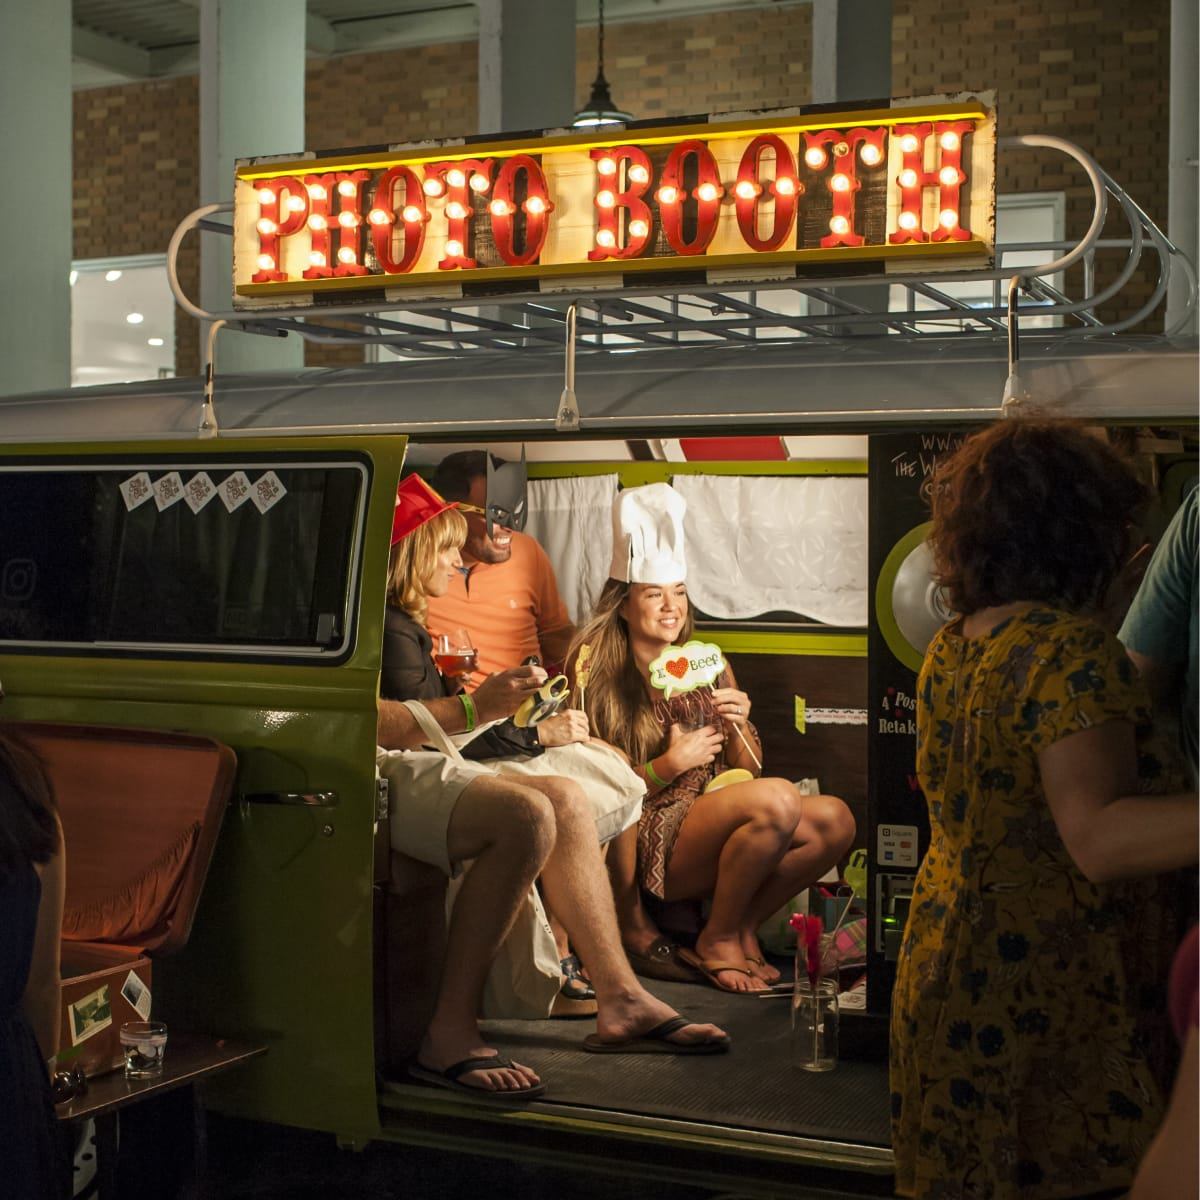 Wee Gpysy Photo Wagon